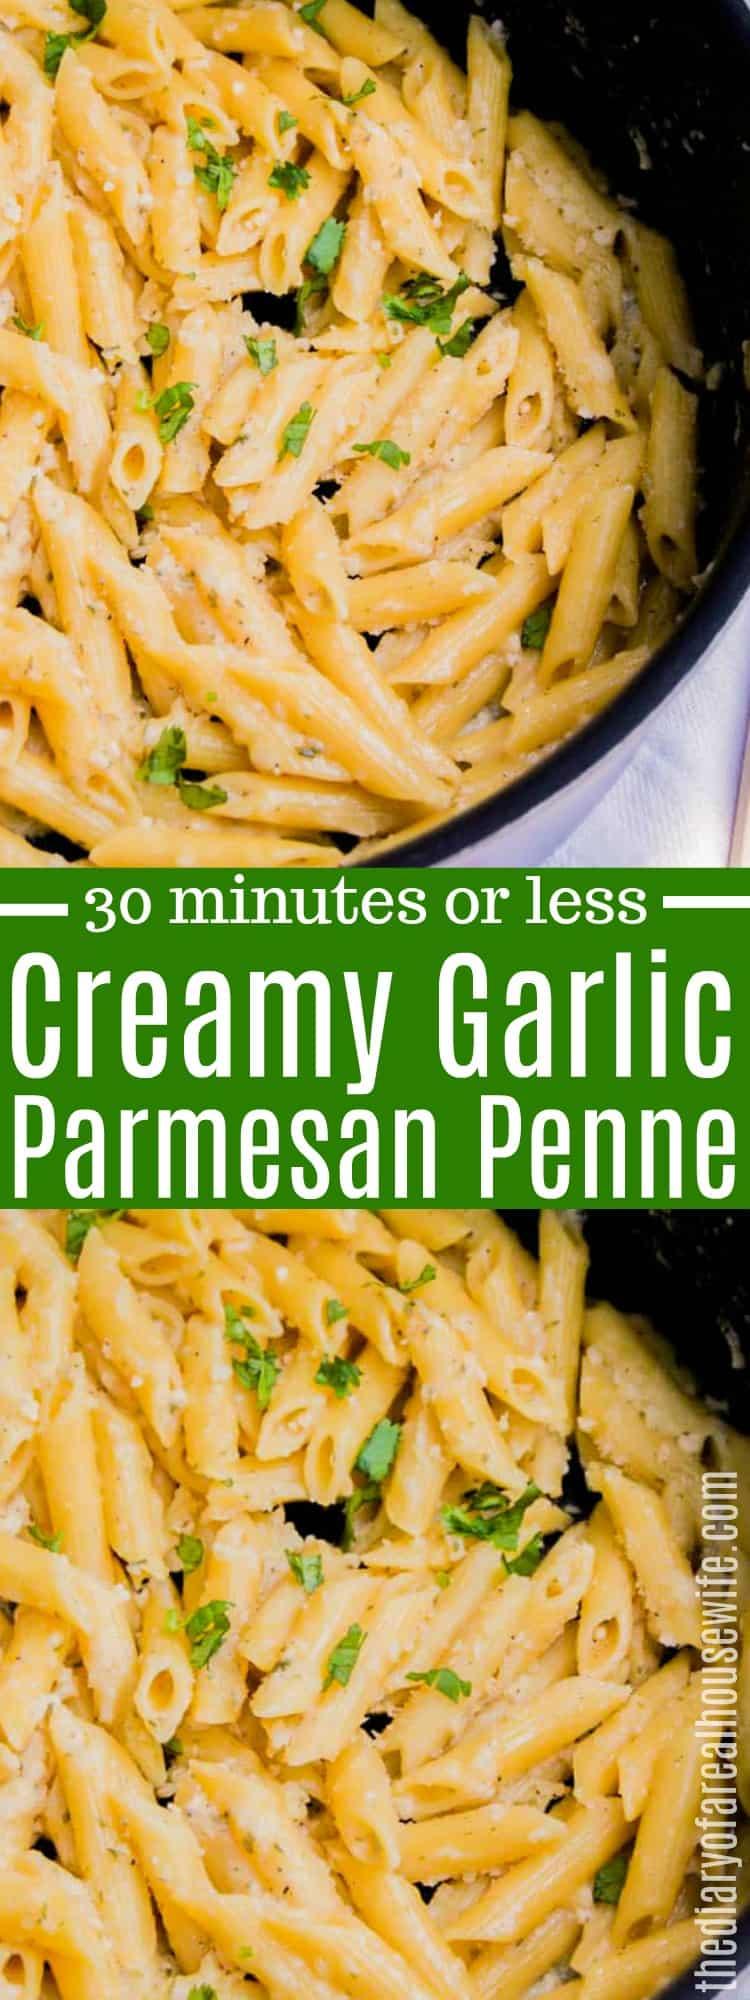 Creamy Garlic Parmesan Penne